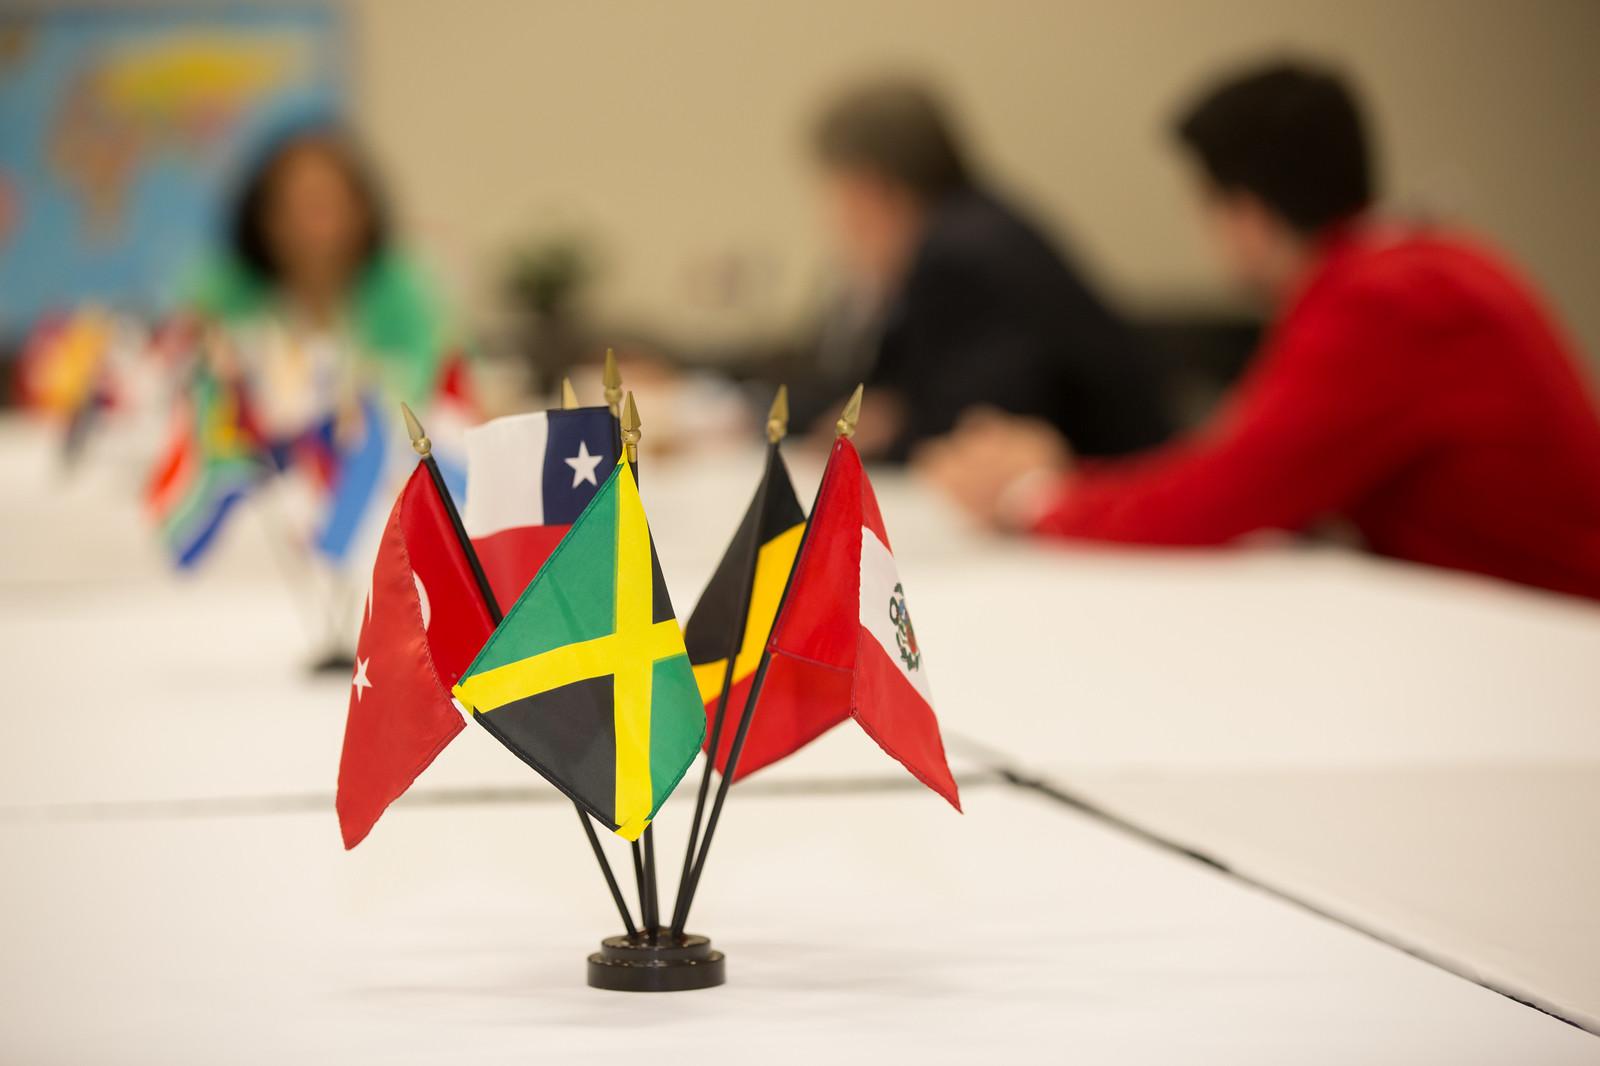 Outreach Event Space - Kansas City - Outreach International  |External Outreach Events